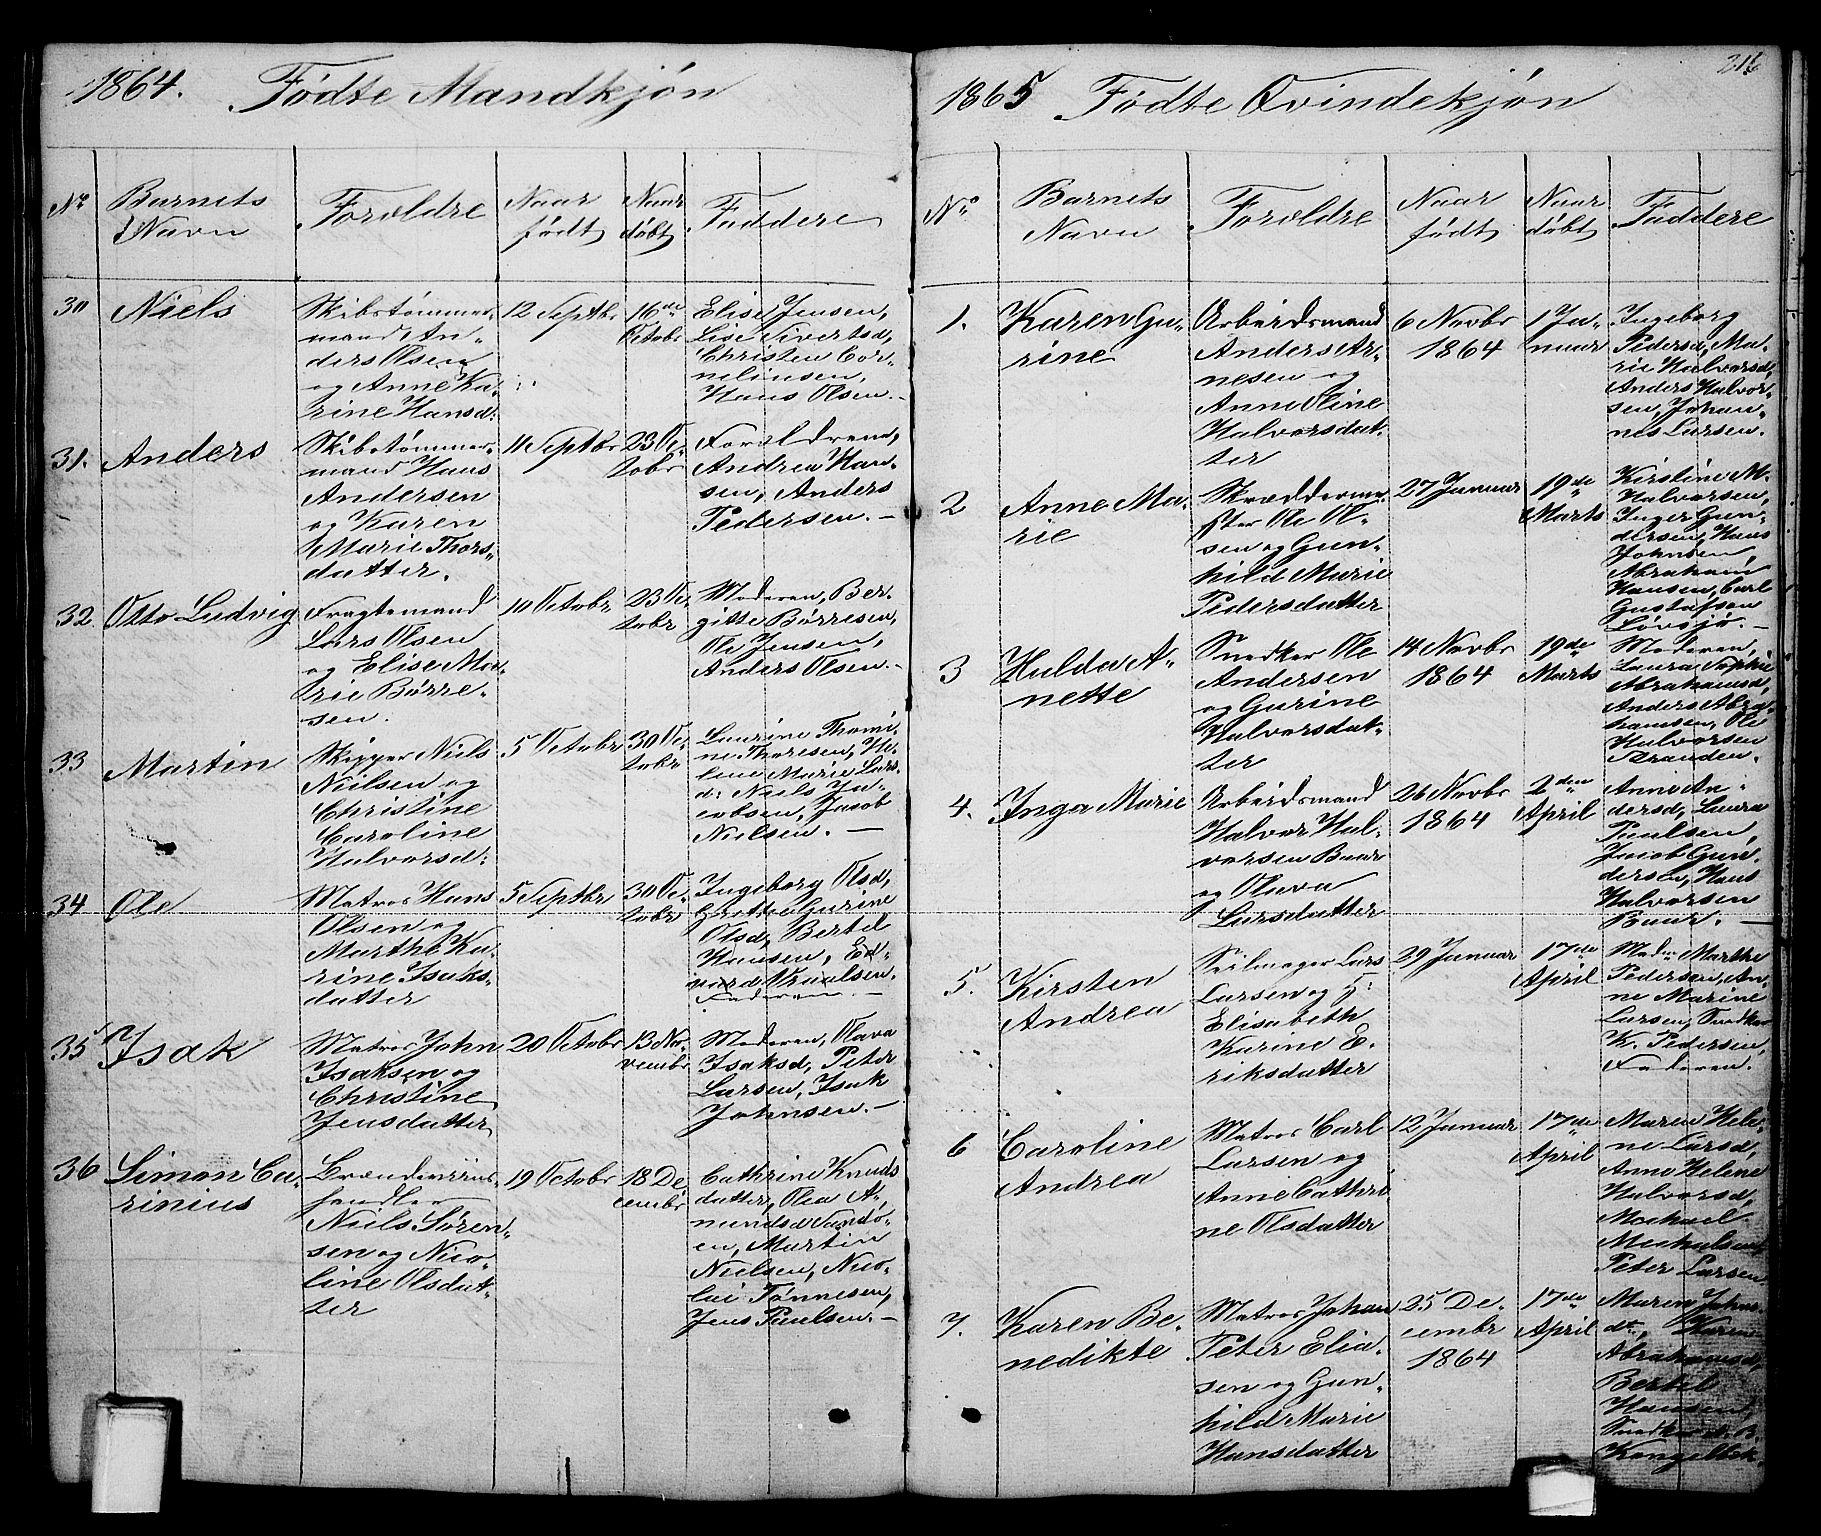 SAKO, Brevik kirkebøker, G/Ga/L0002: Klokkerbok nr. 2, 1846-1865, s. 216